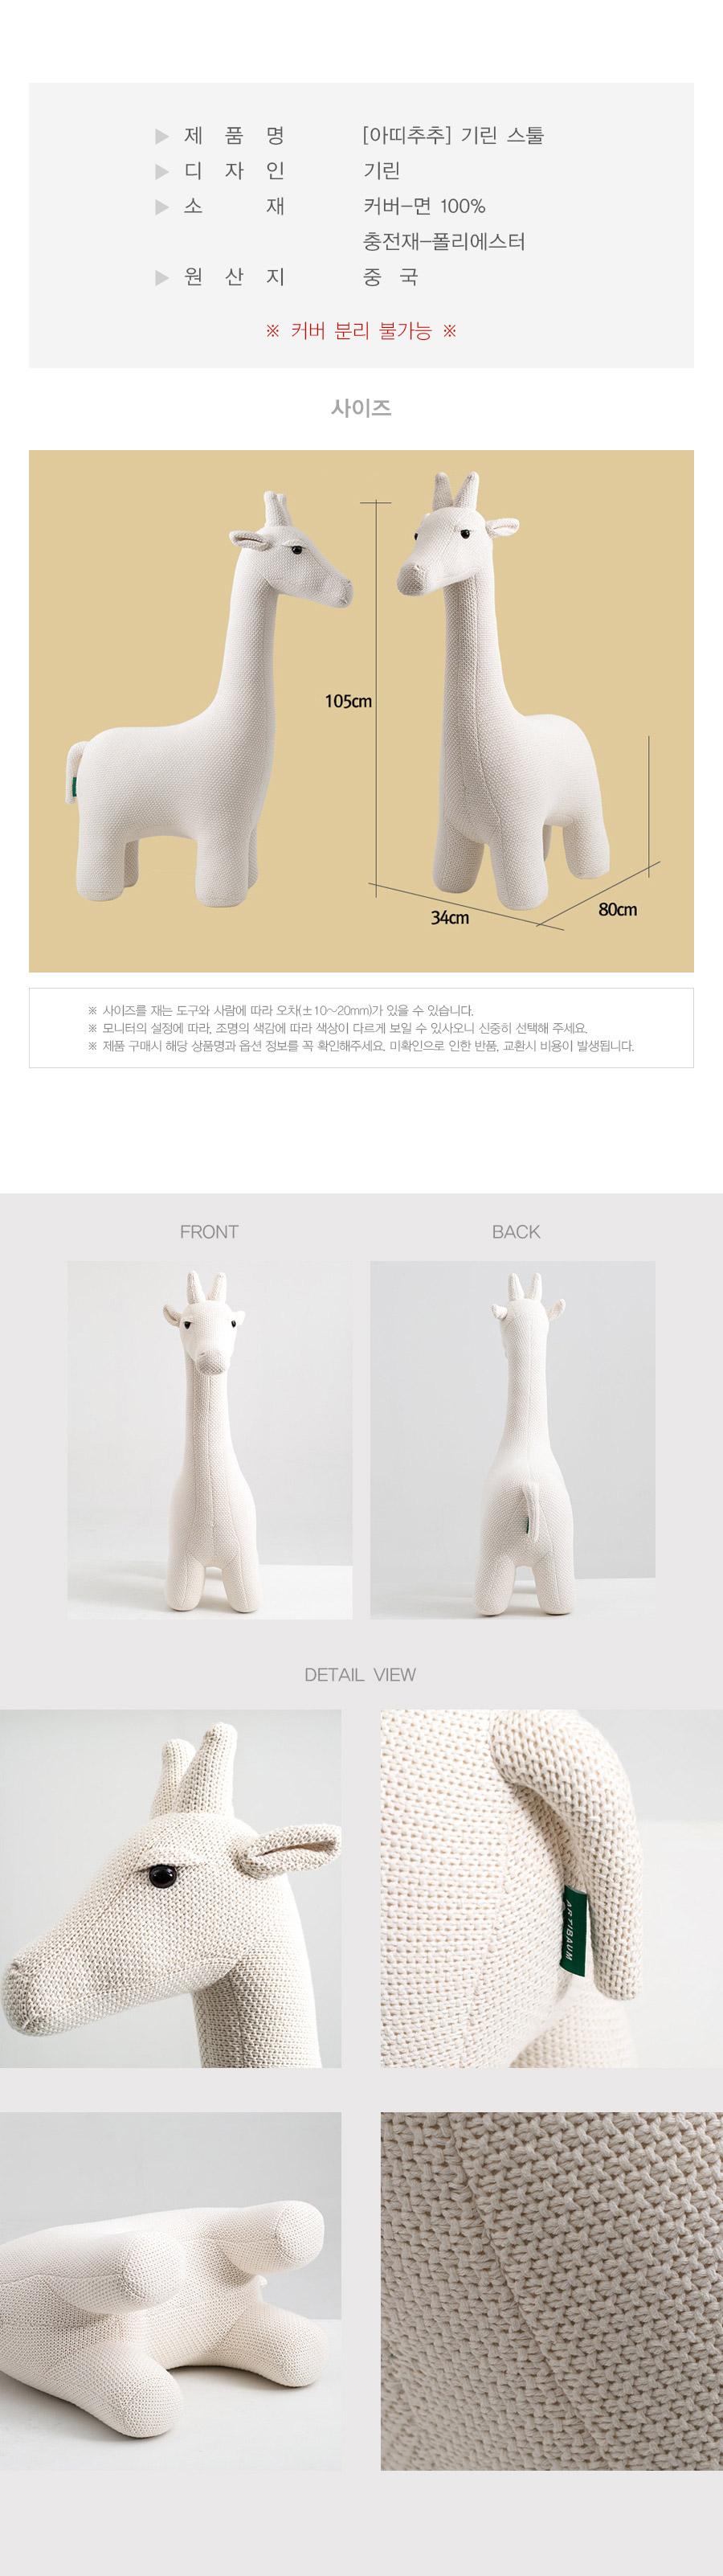 02-2_info_giraffe_stool.jpg